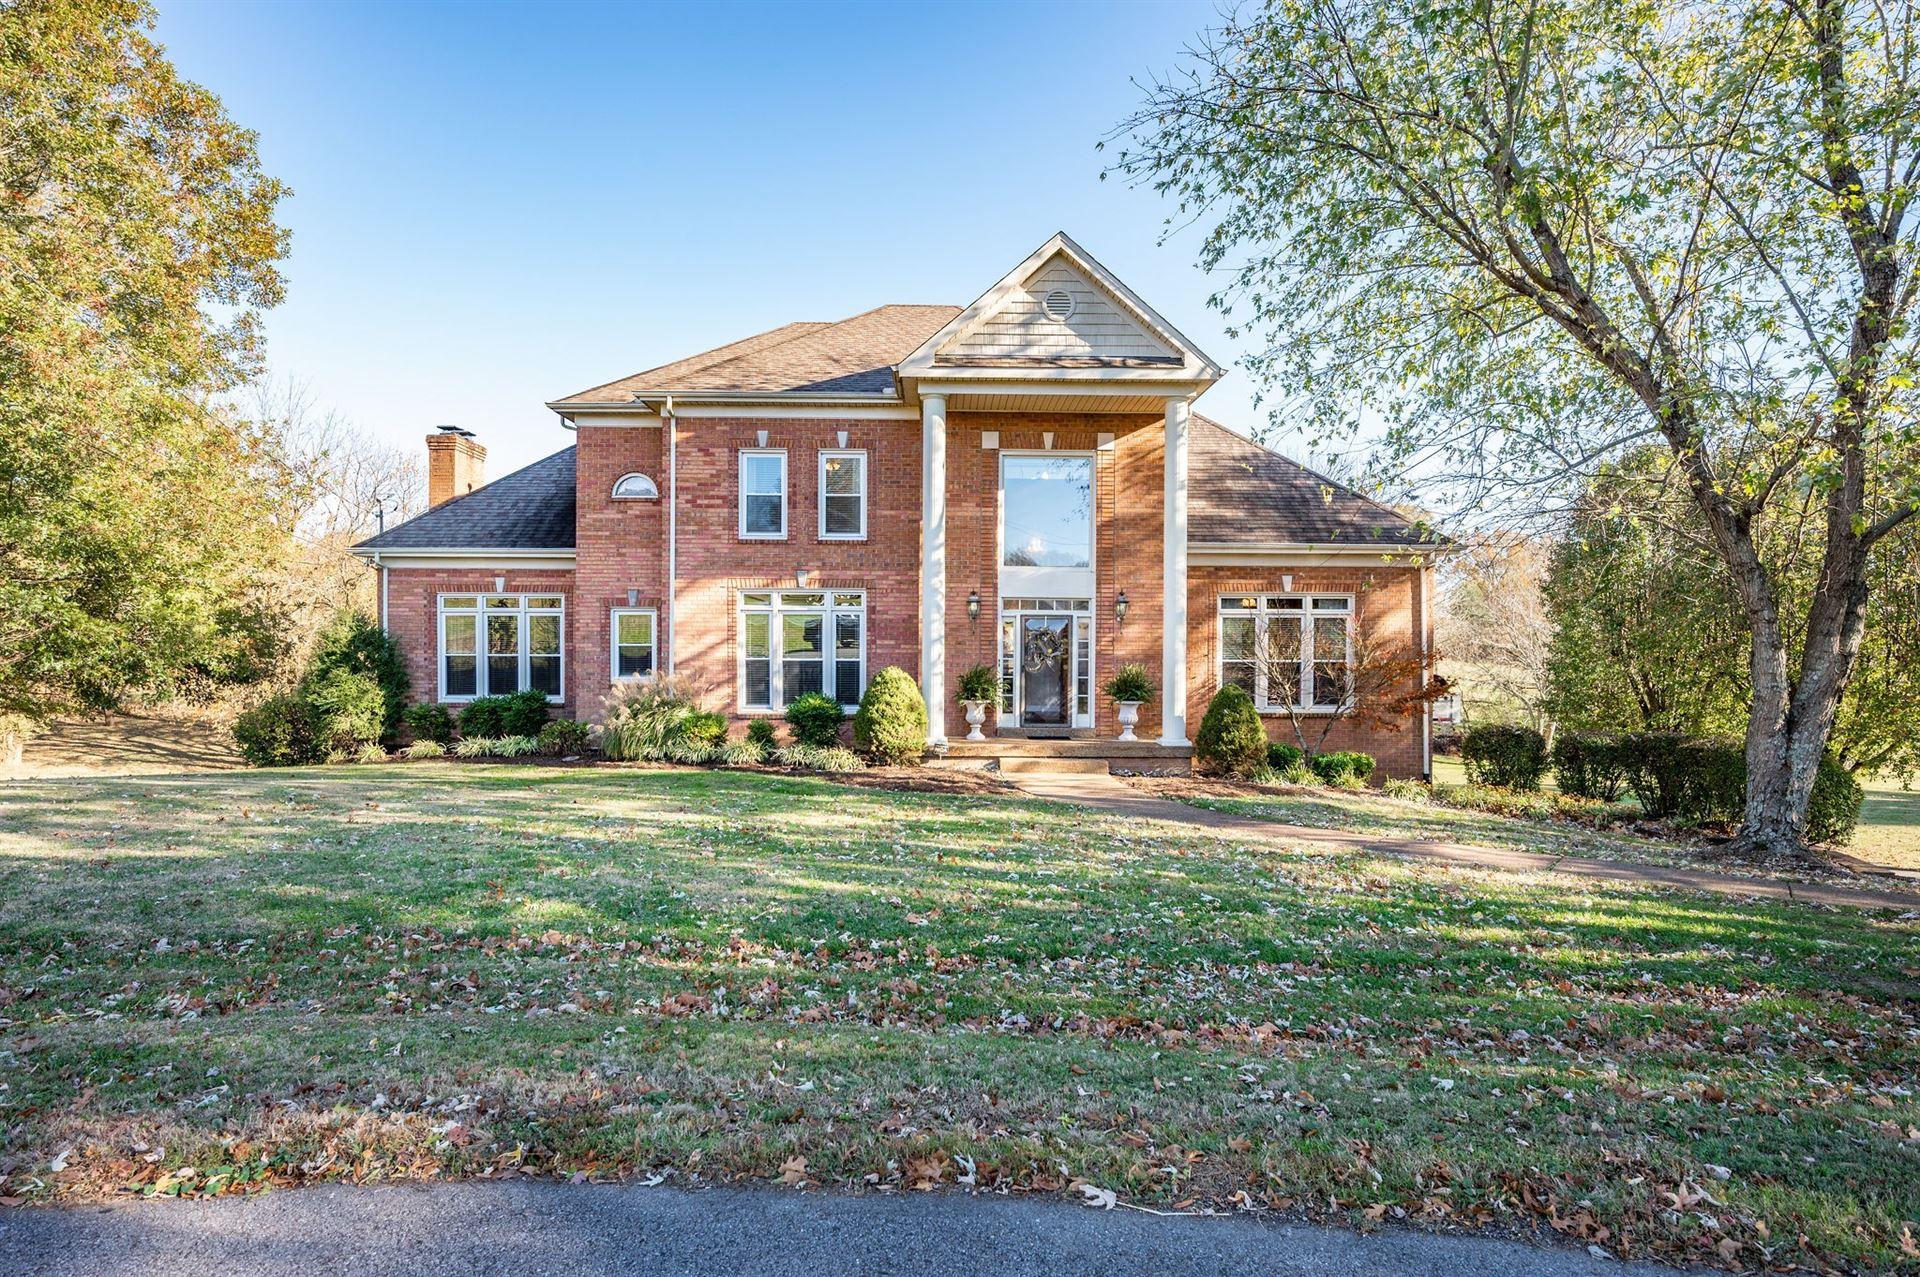 1210 Forestpointe, Hendersonville, TN 37075 - MLS#: 2209438